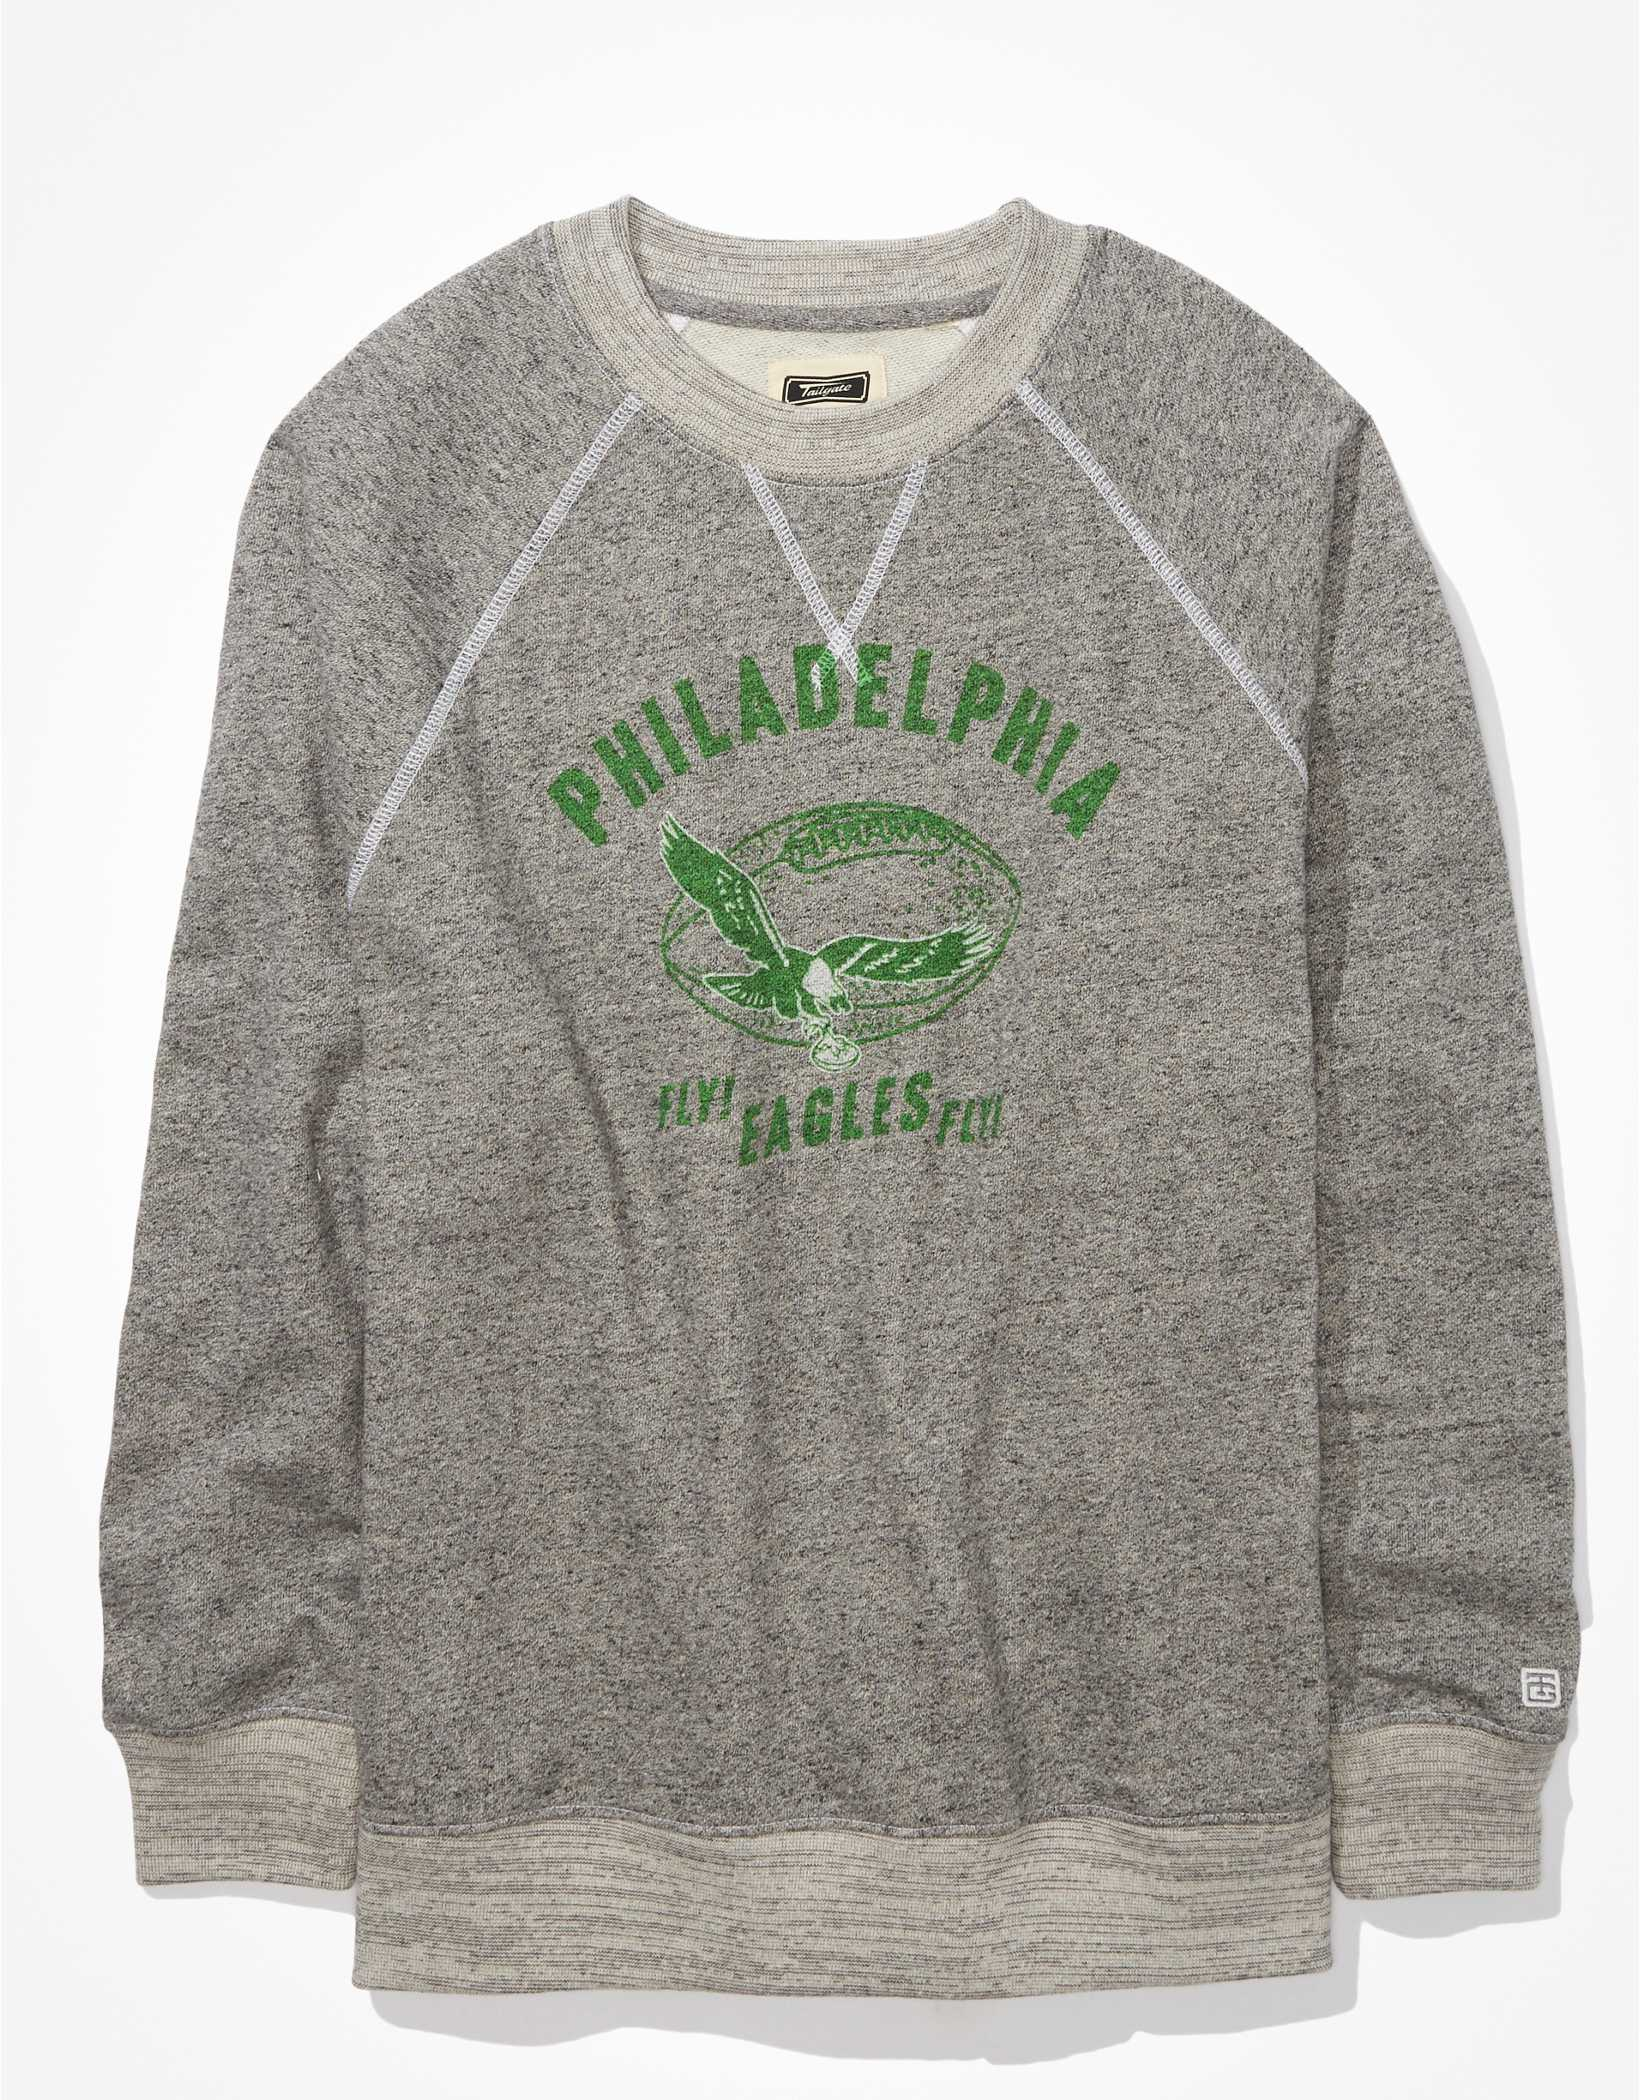 Tailgate Women's Philadelphia Eagles Oversized Fleece Sweatshirt